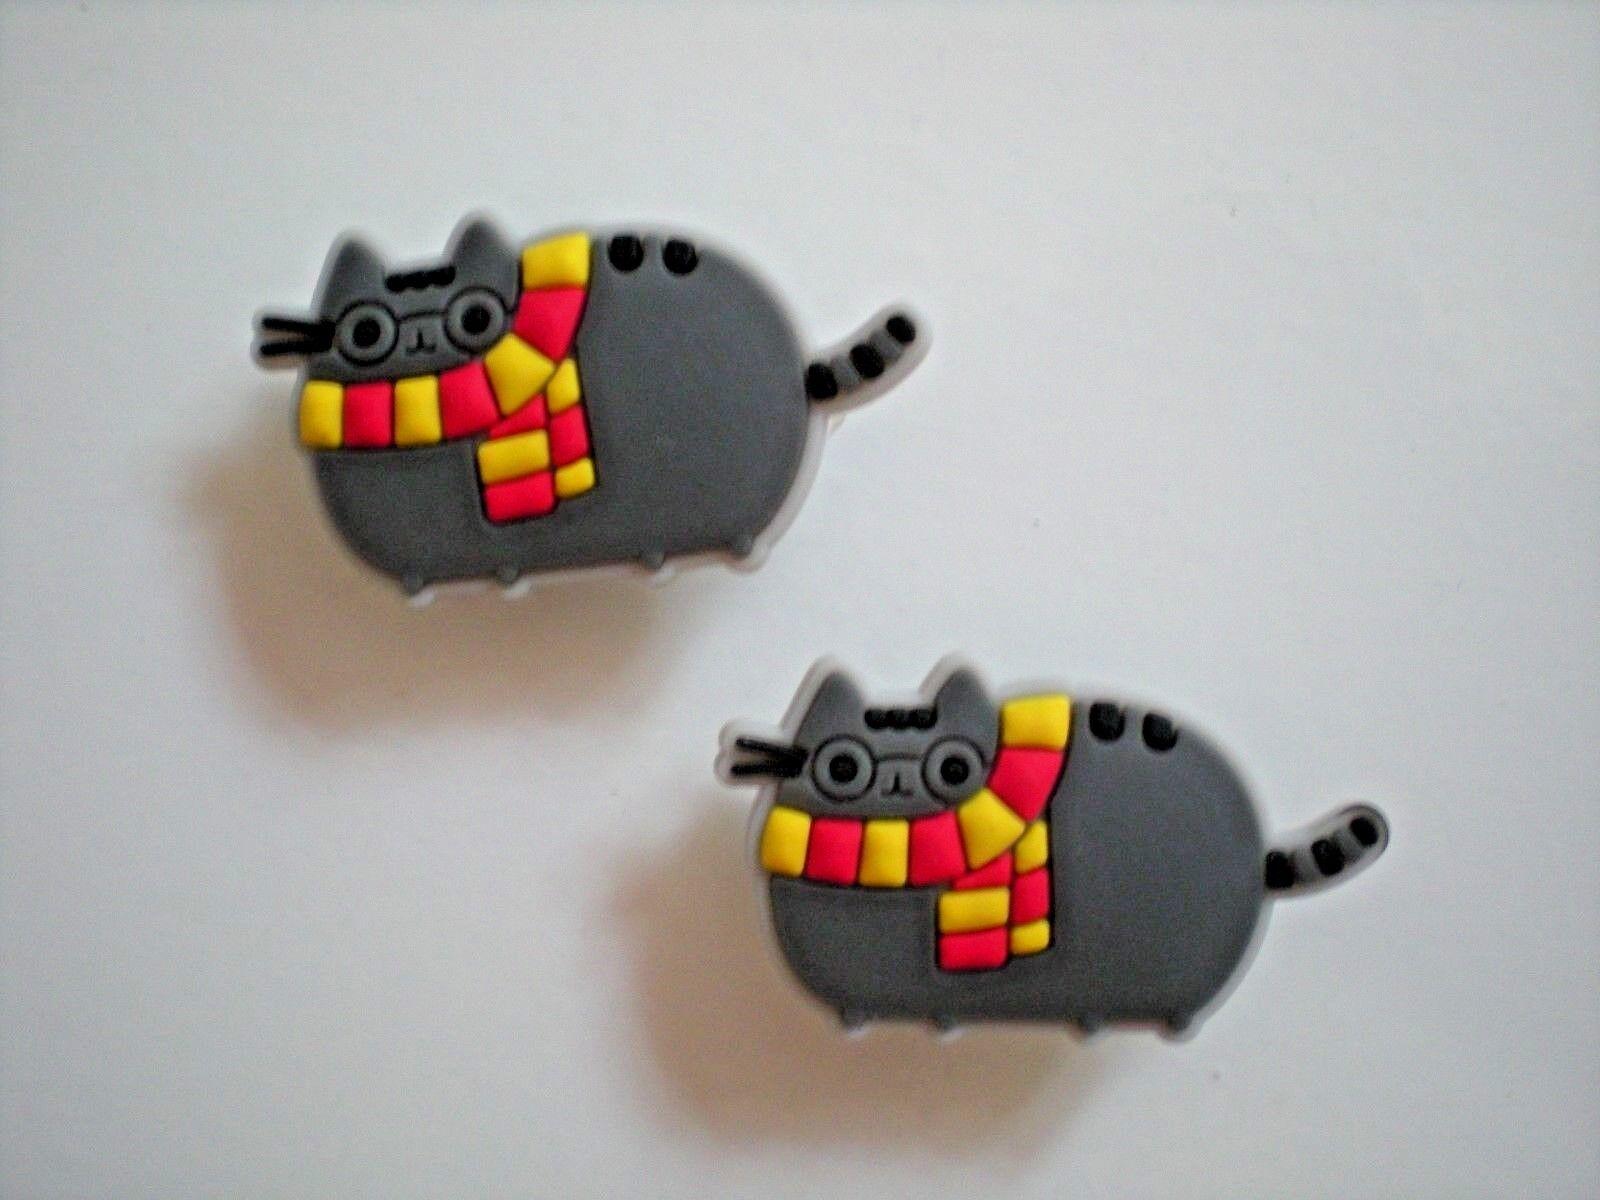 da53888fd Details about Jibbitz Croc Clog Shoe Plug Button Charm WristBand  Accessories 2 Kitty Cat